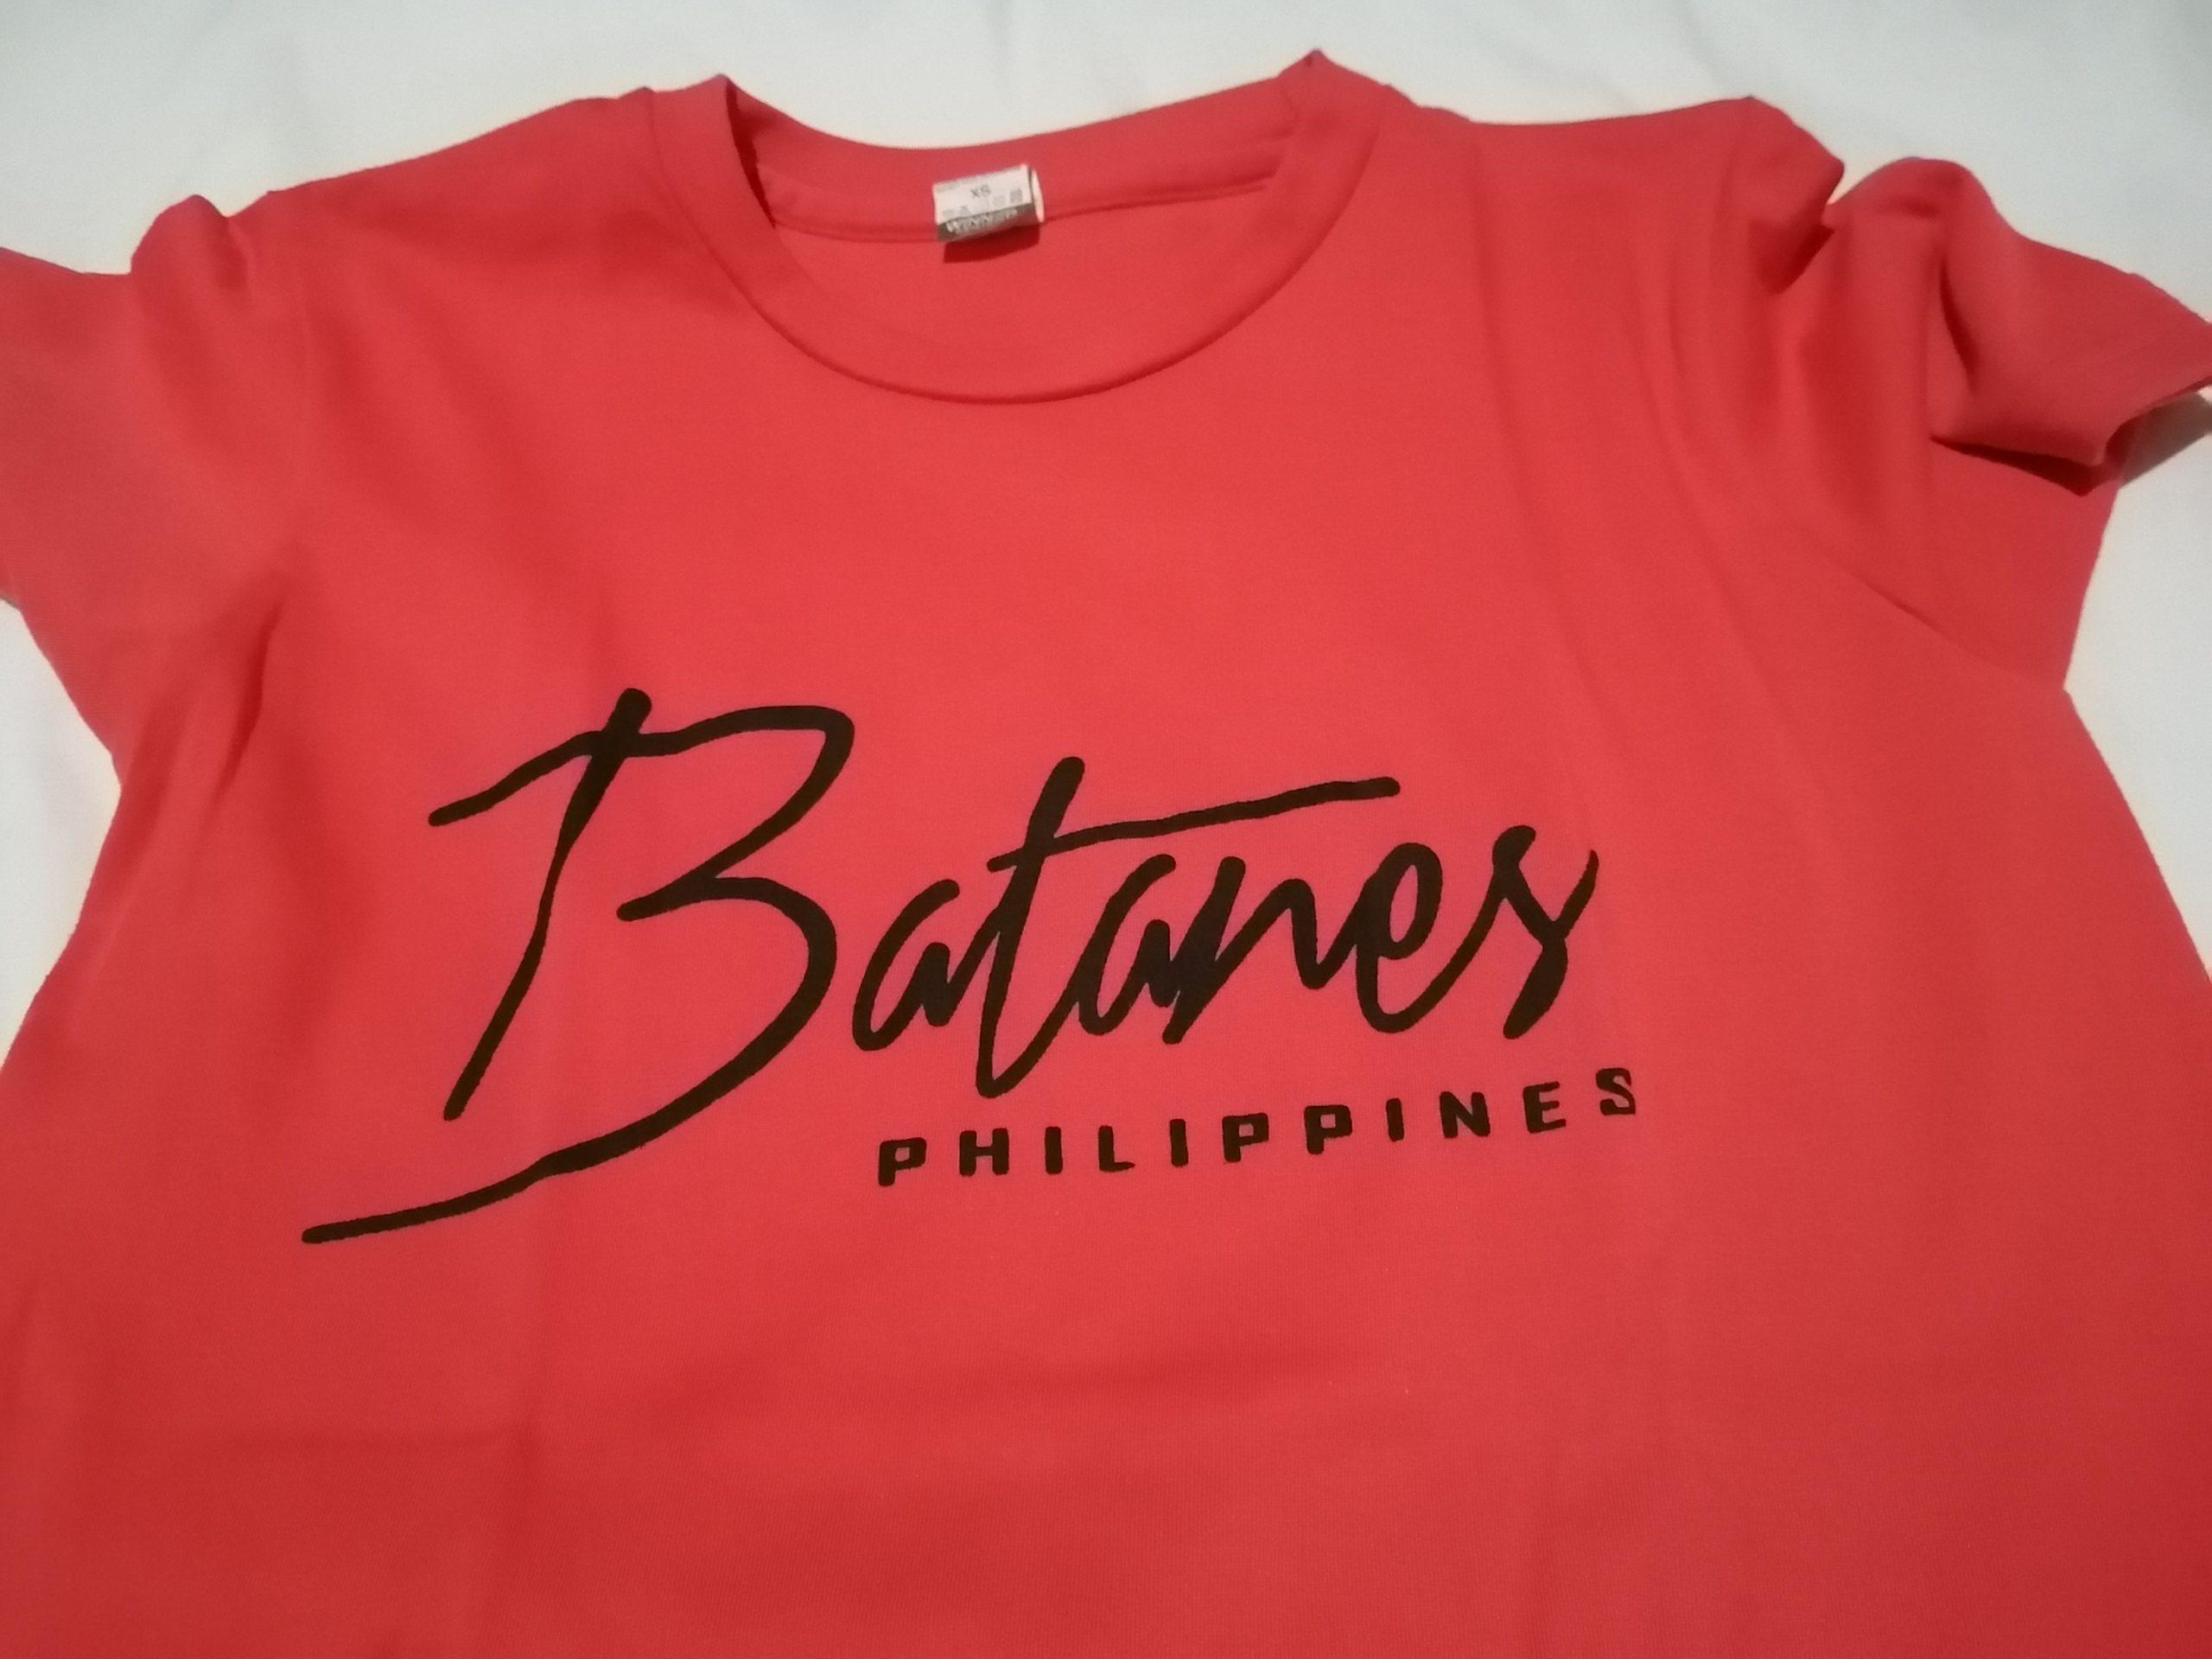 Batanes souvenir t-shirt